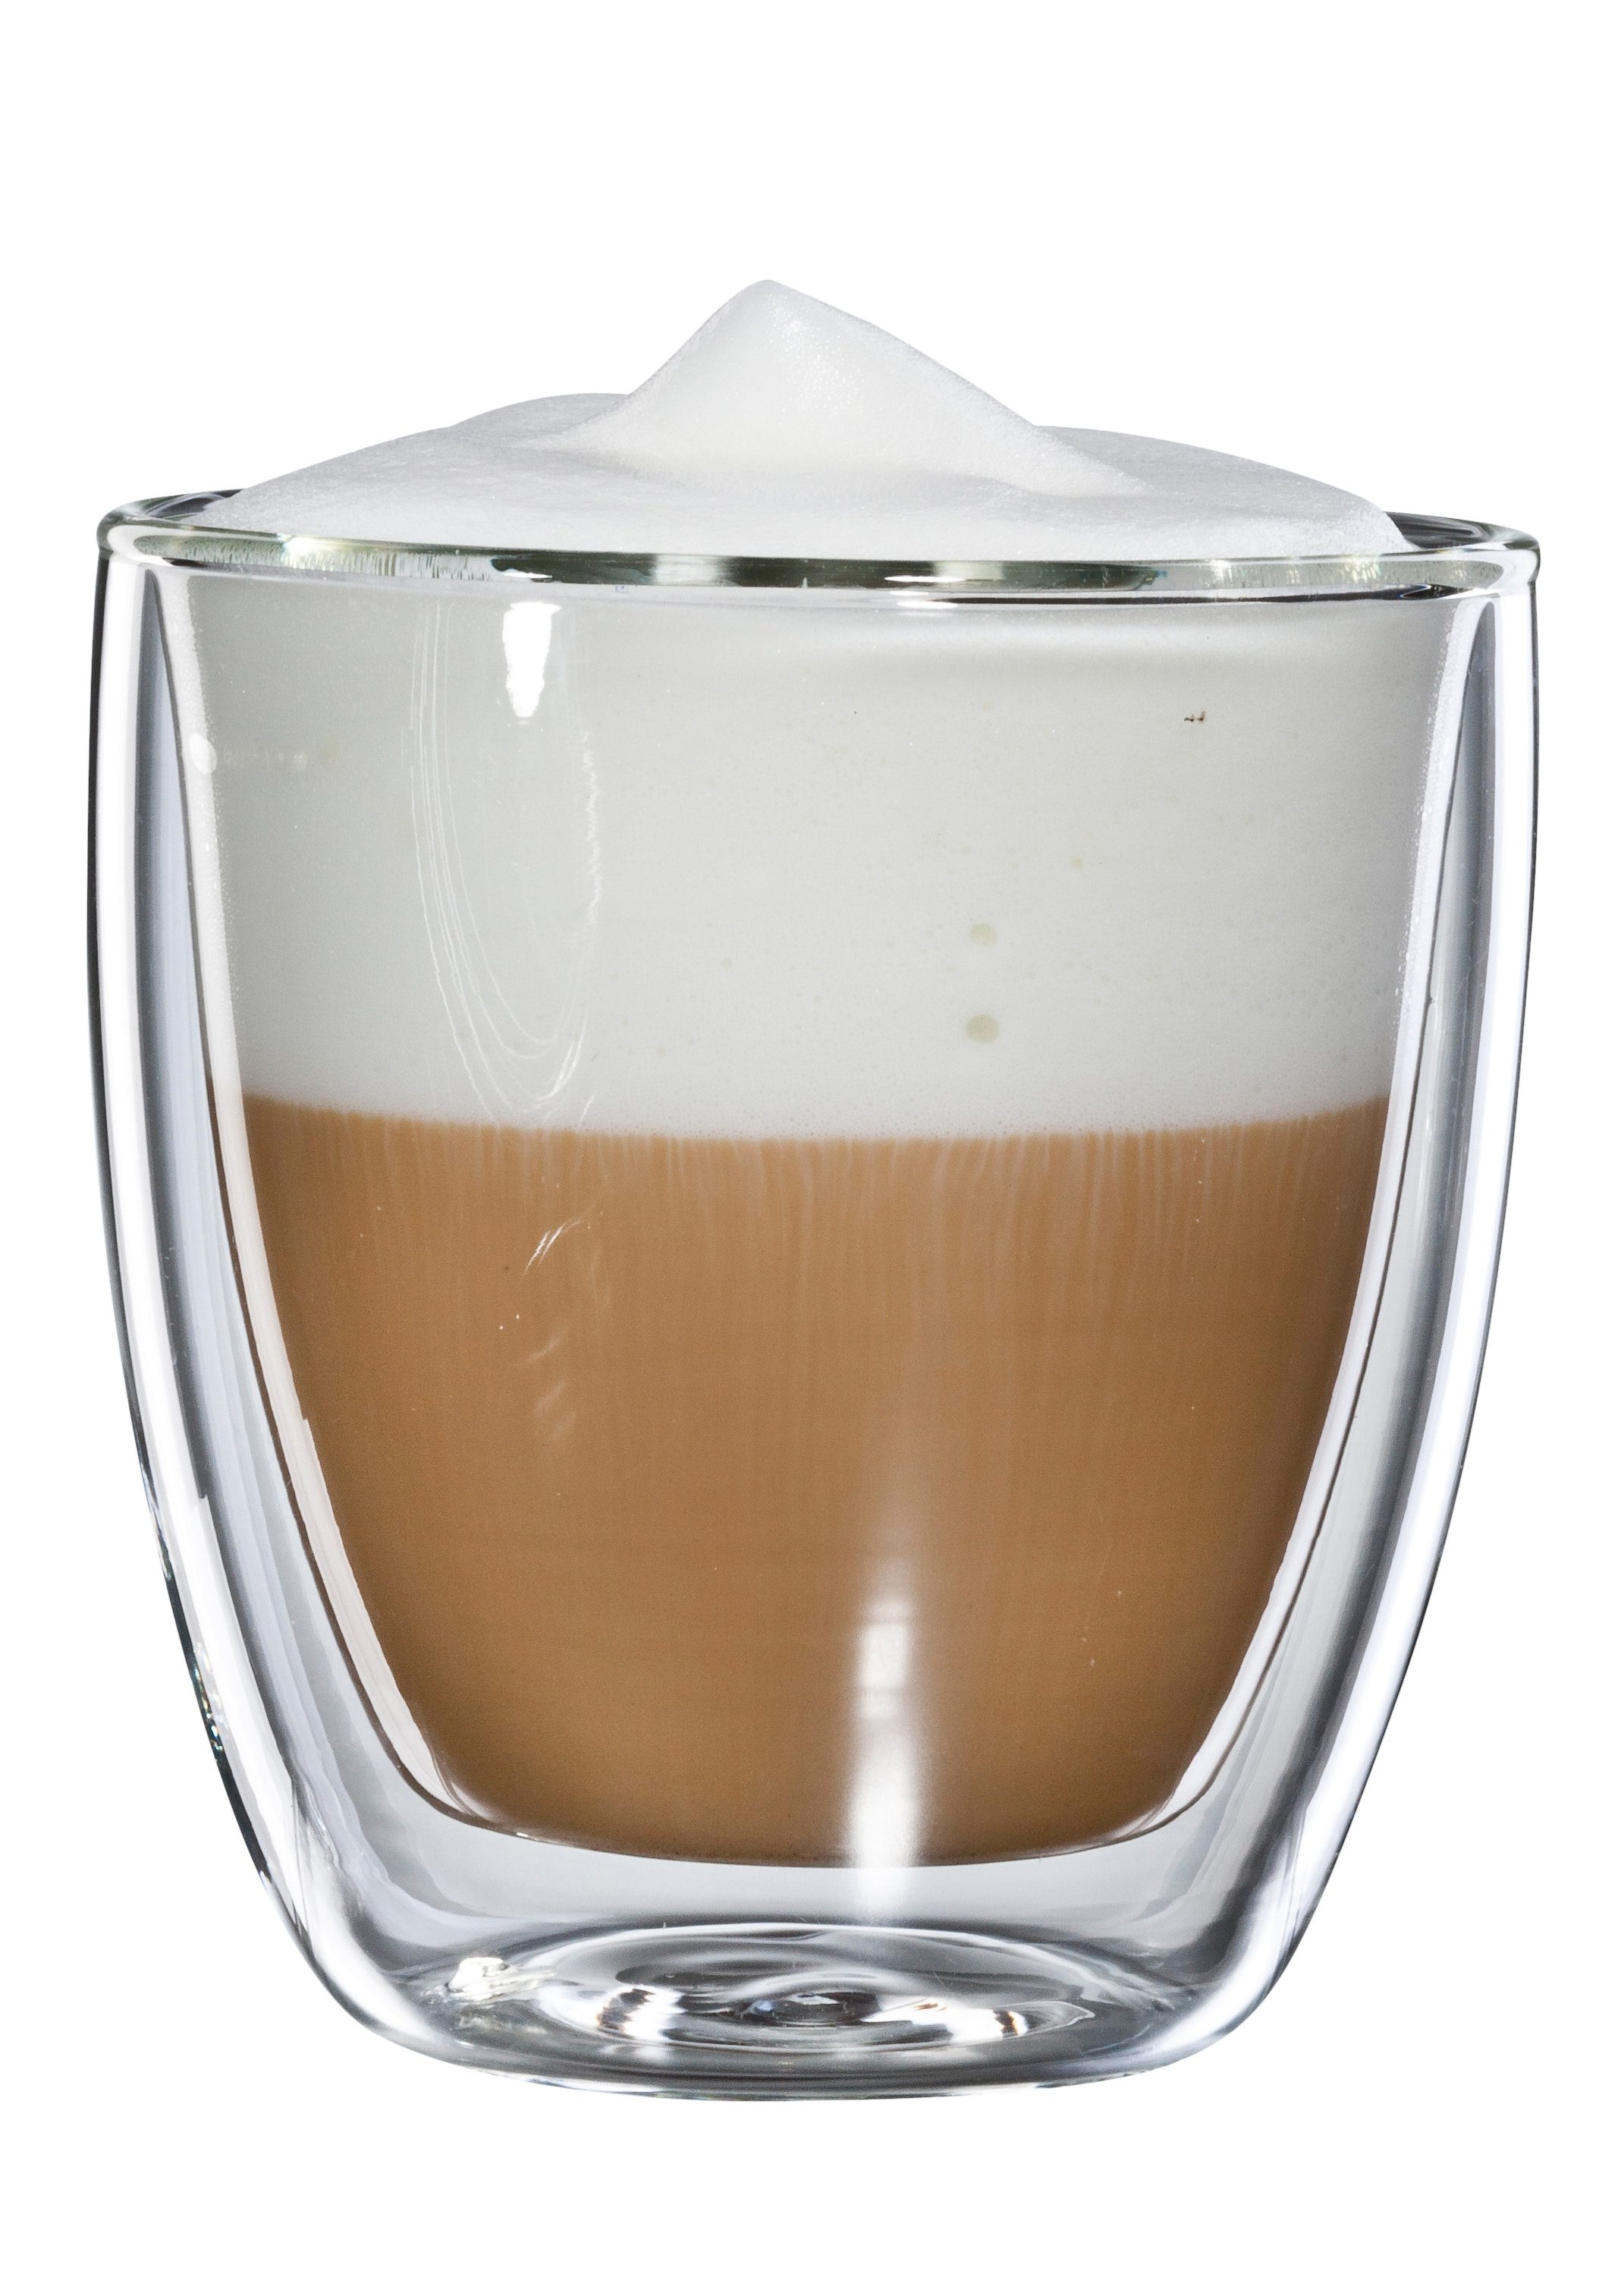 bloomix Cappuccino-Glas, 4er Set, »Cappuccino Grande«, 250 ml